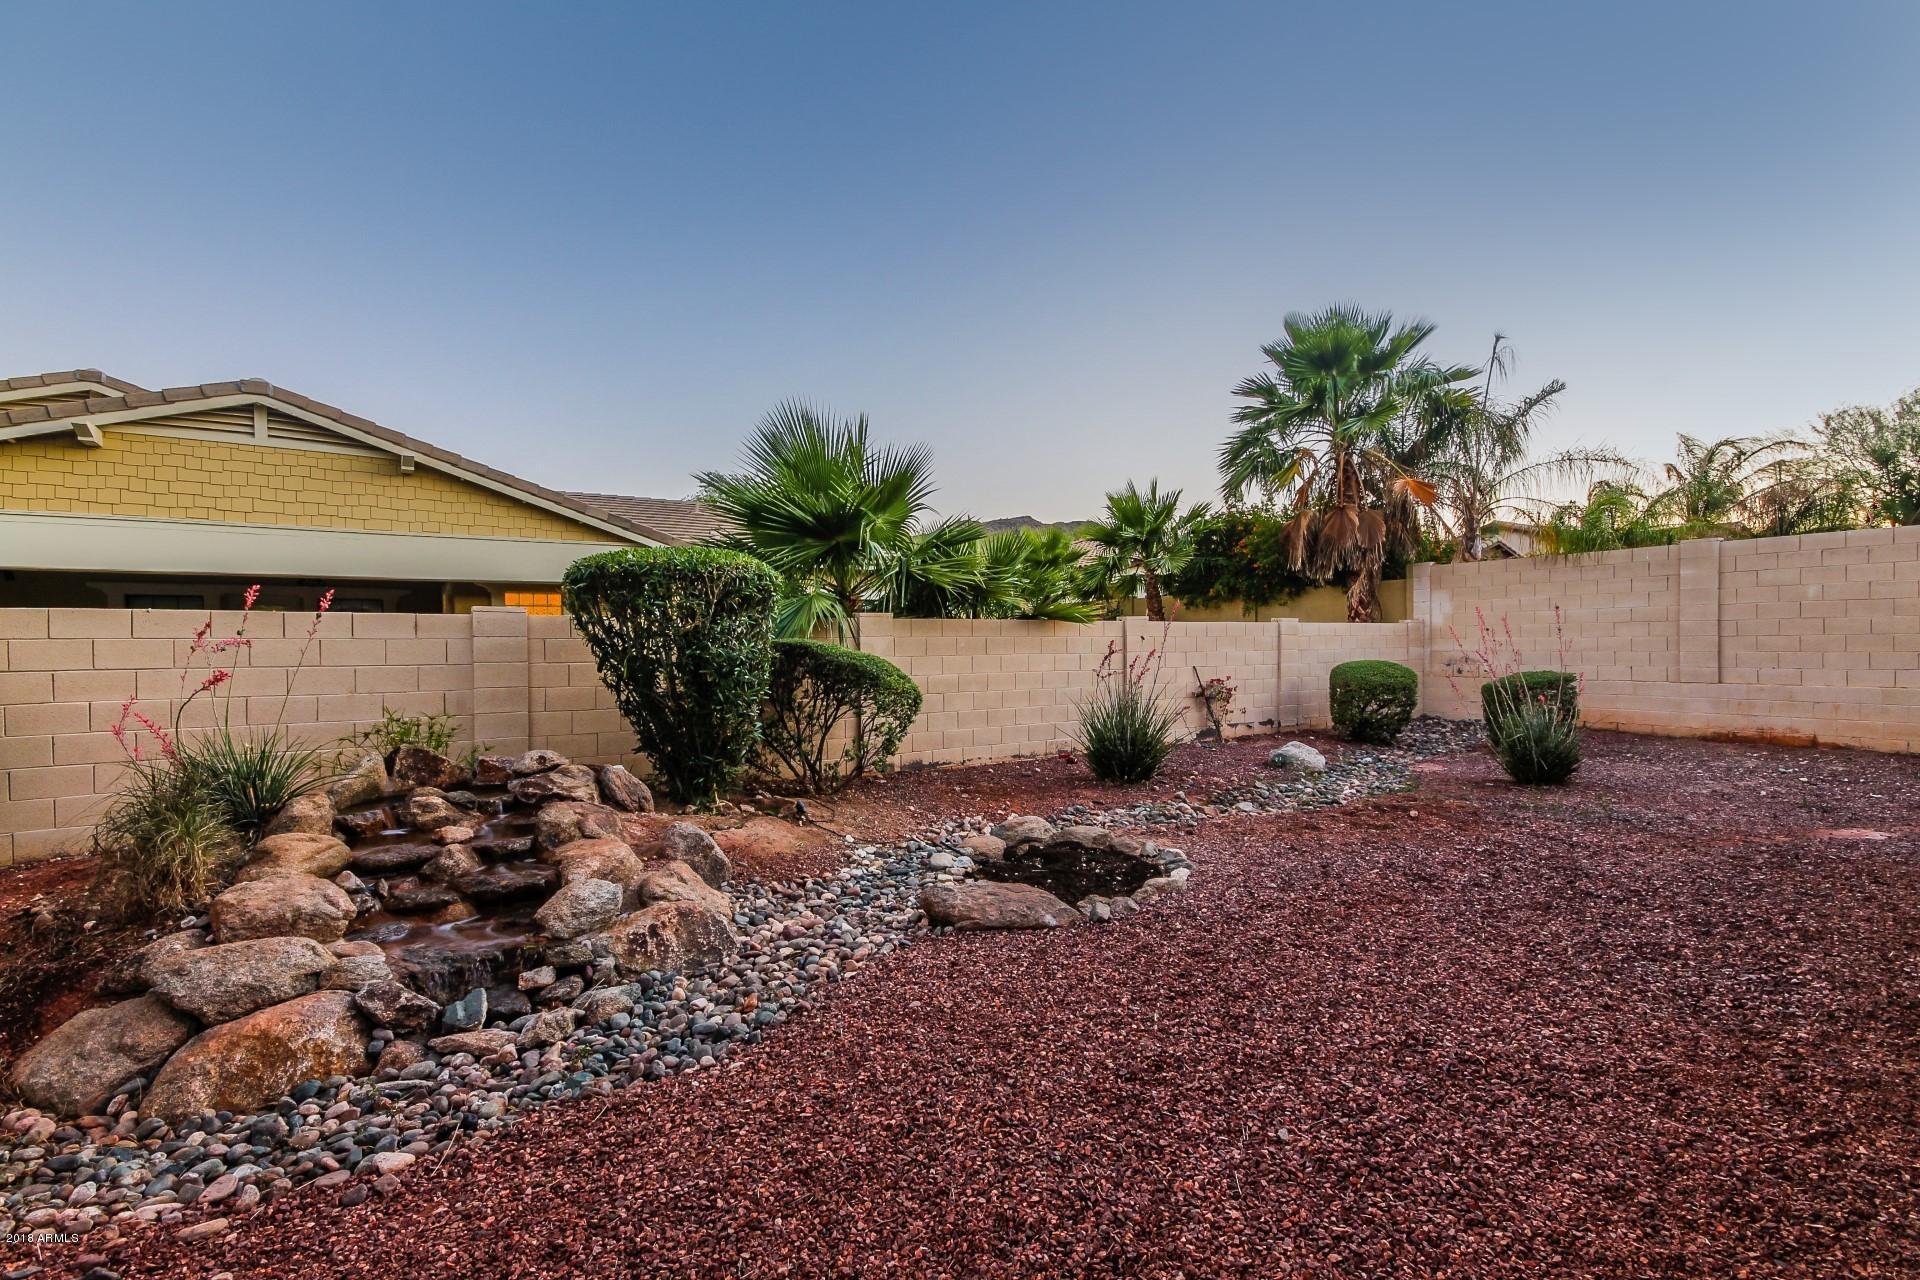 MLS 5771045 21345 W Cholla Trail, Buckeye, AZ 85396 Buckeye AZ Four Bedroom